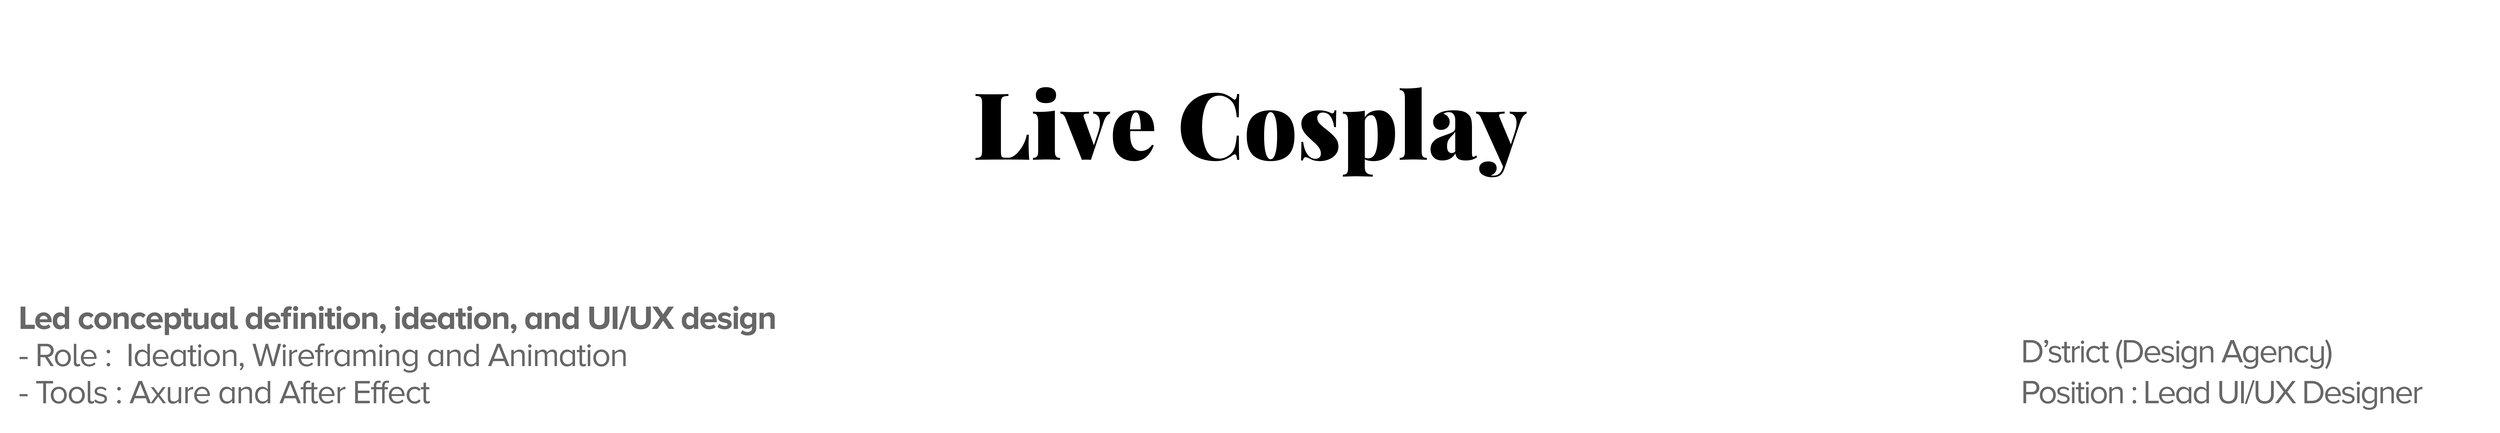 LiveCosplay.jpg